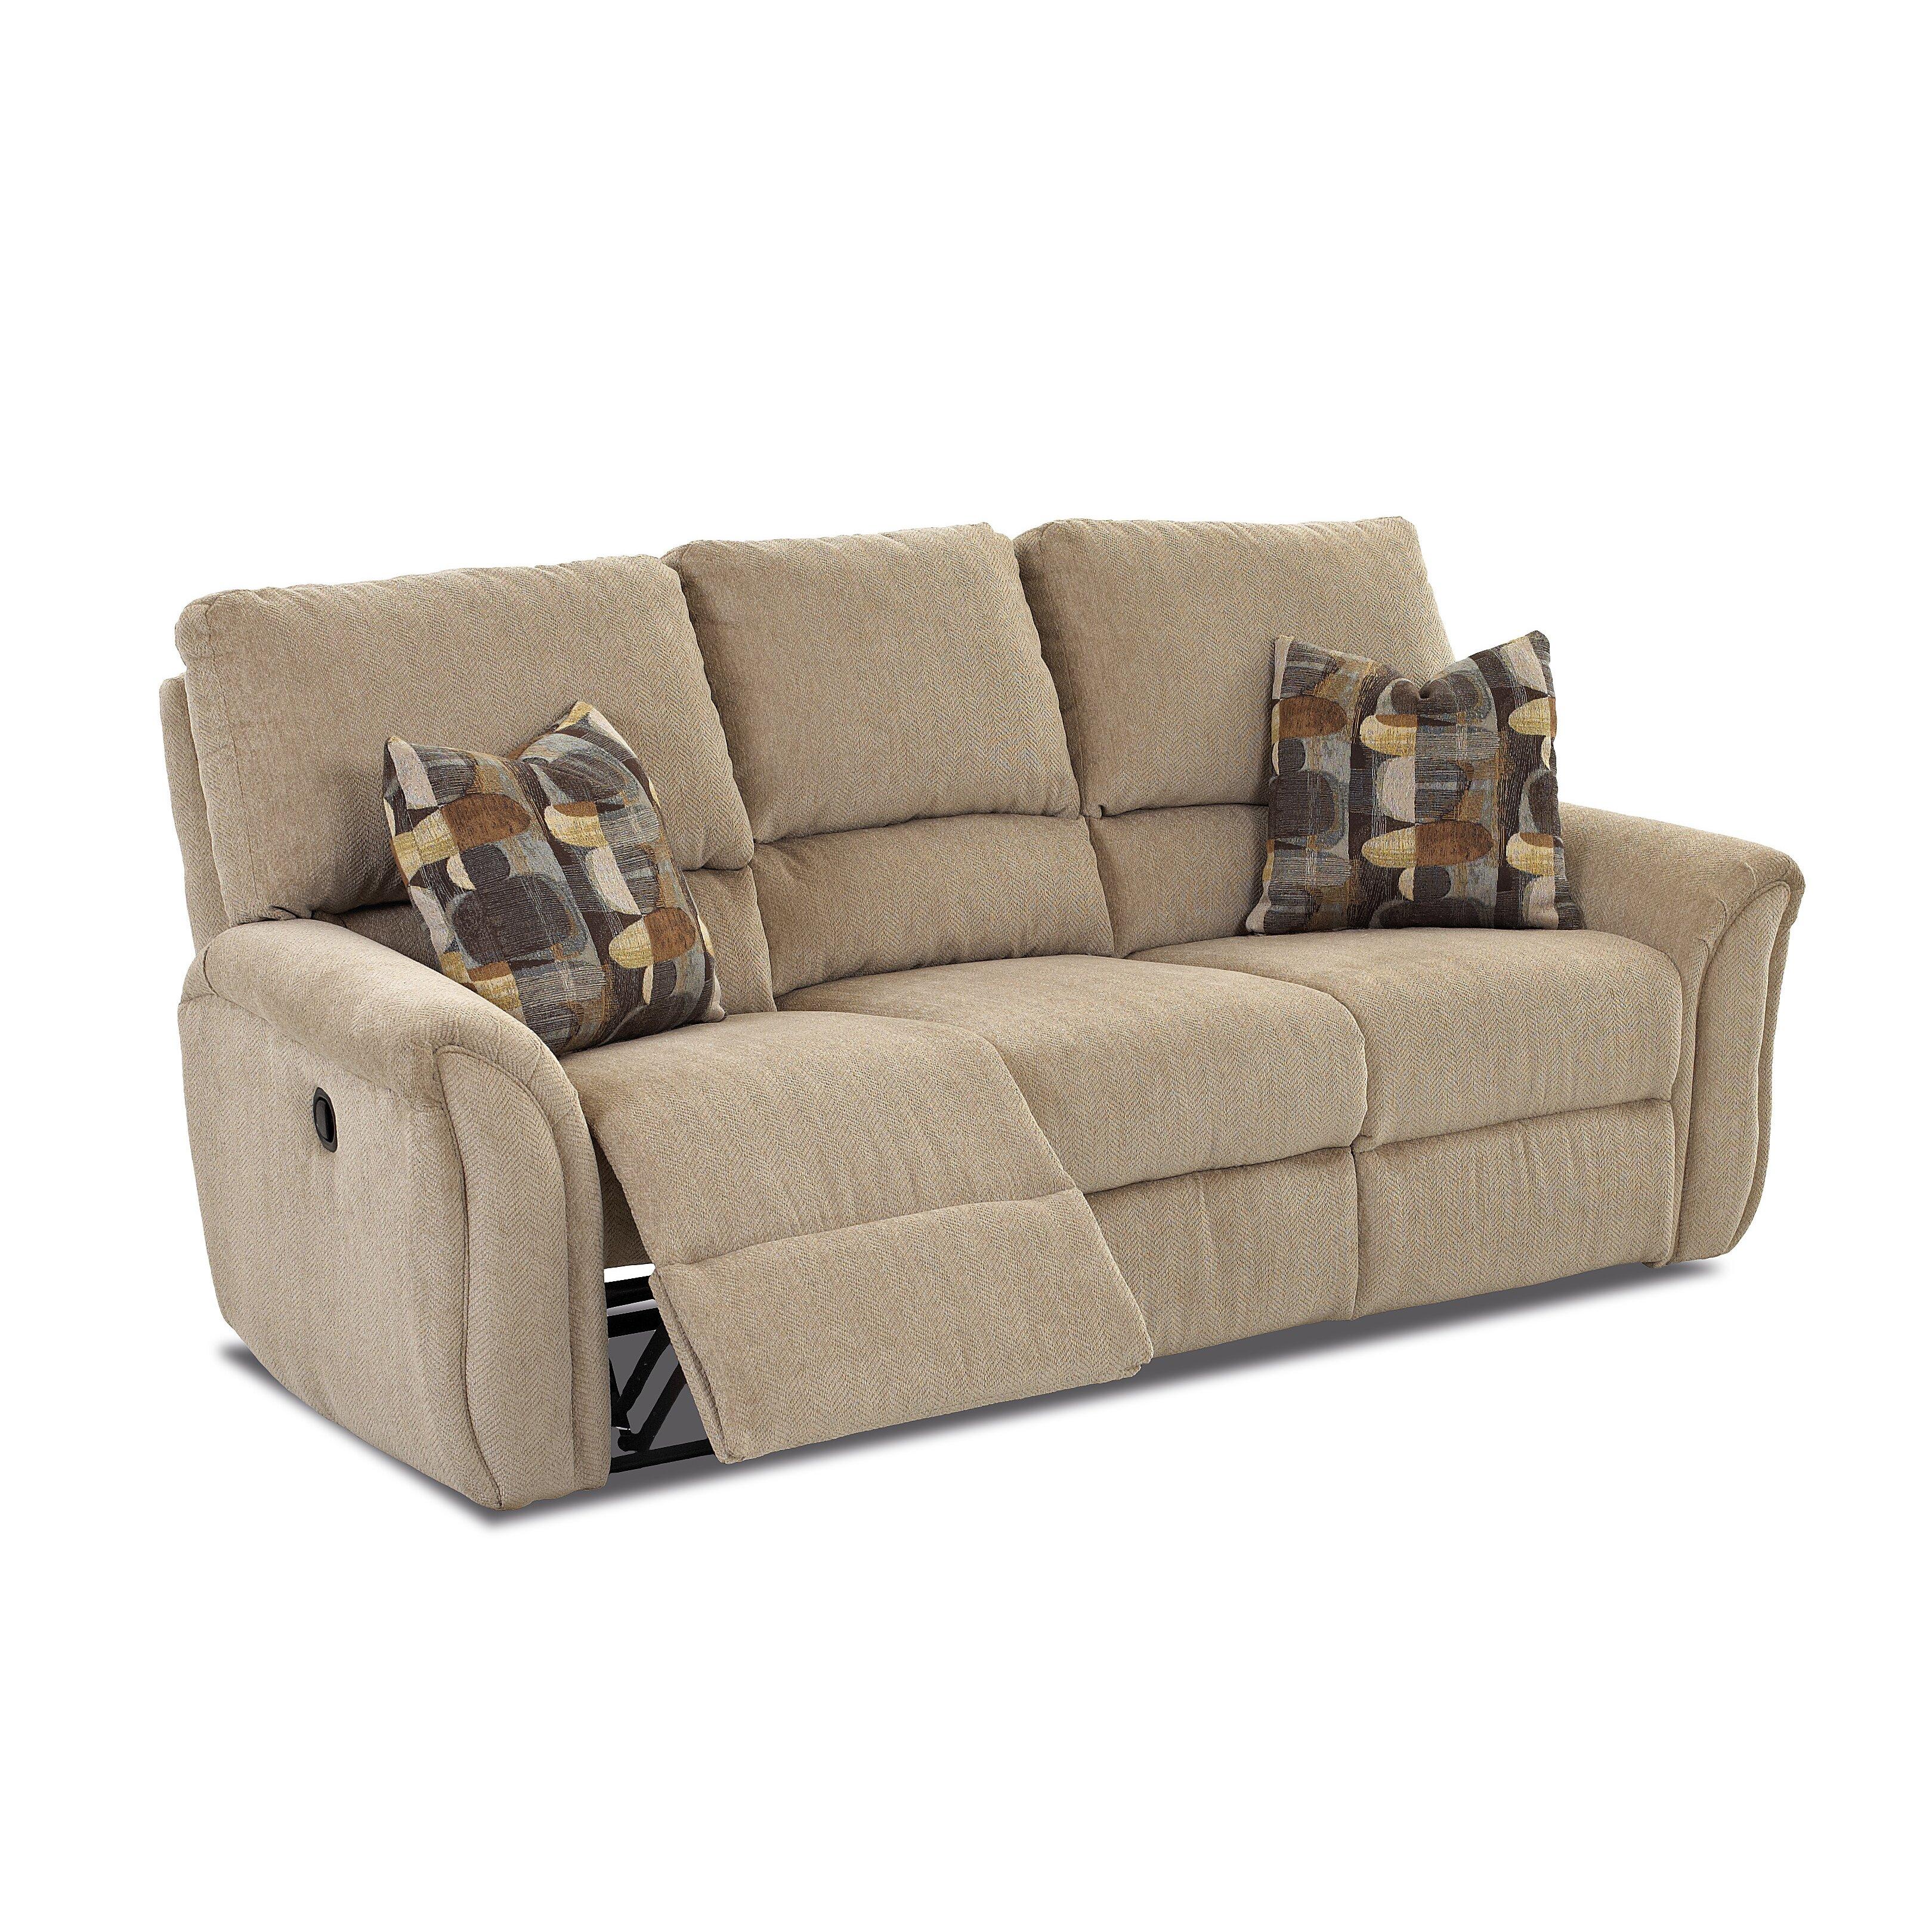 Klaussner furniture miley reclining sofa wayfair for Klaussner sofa